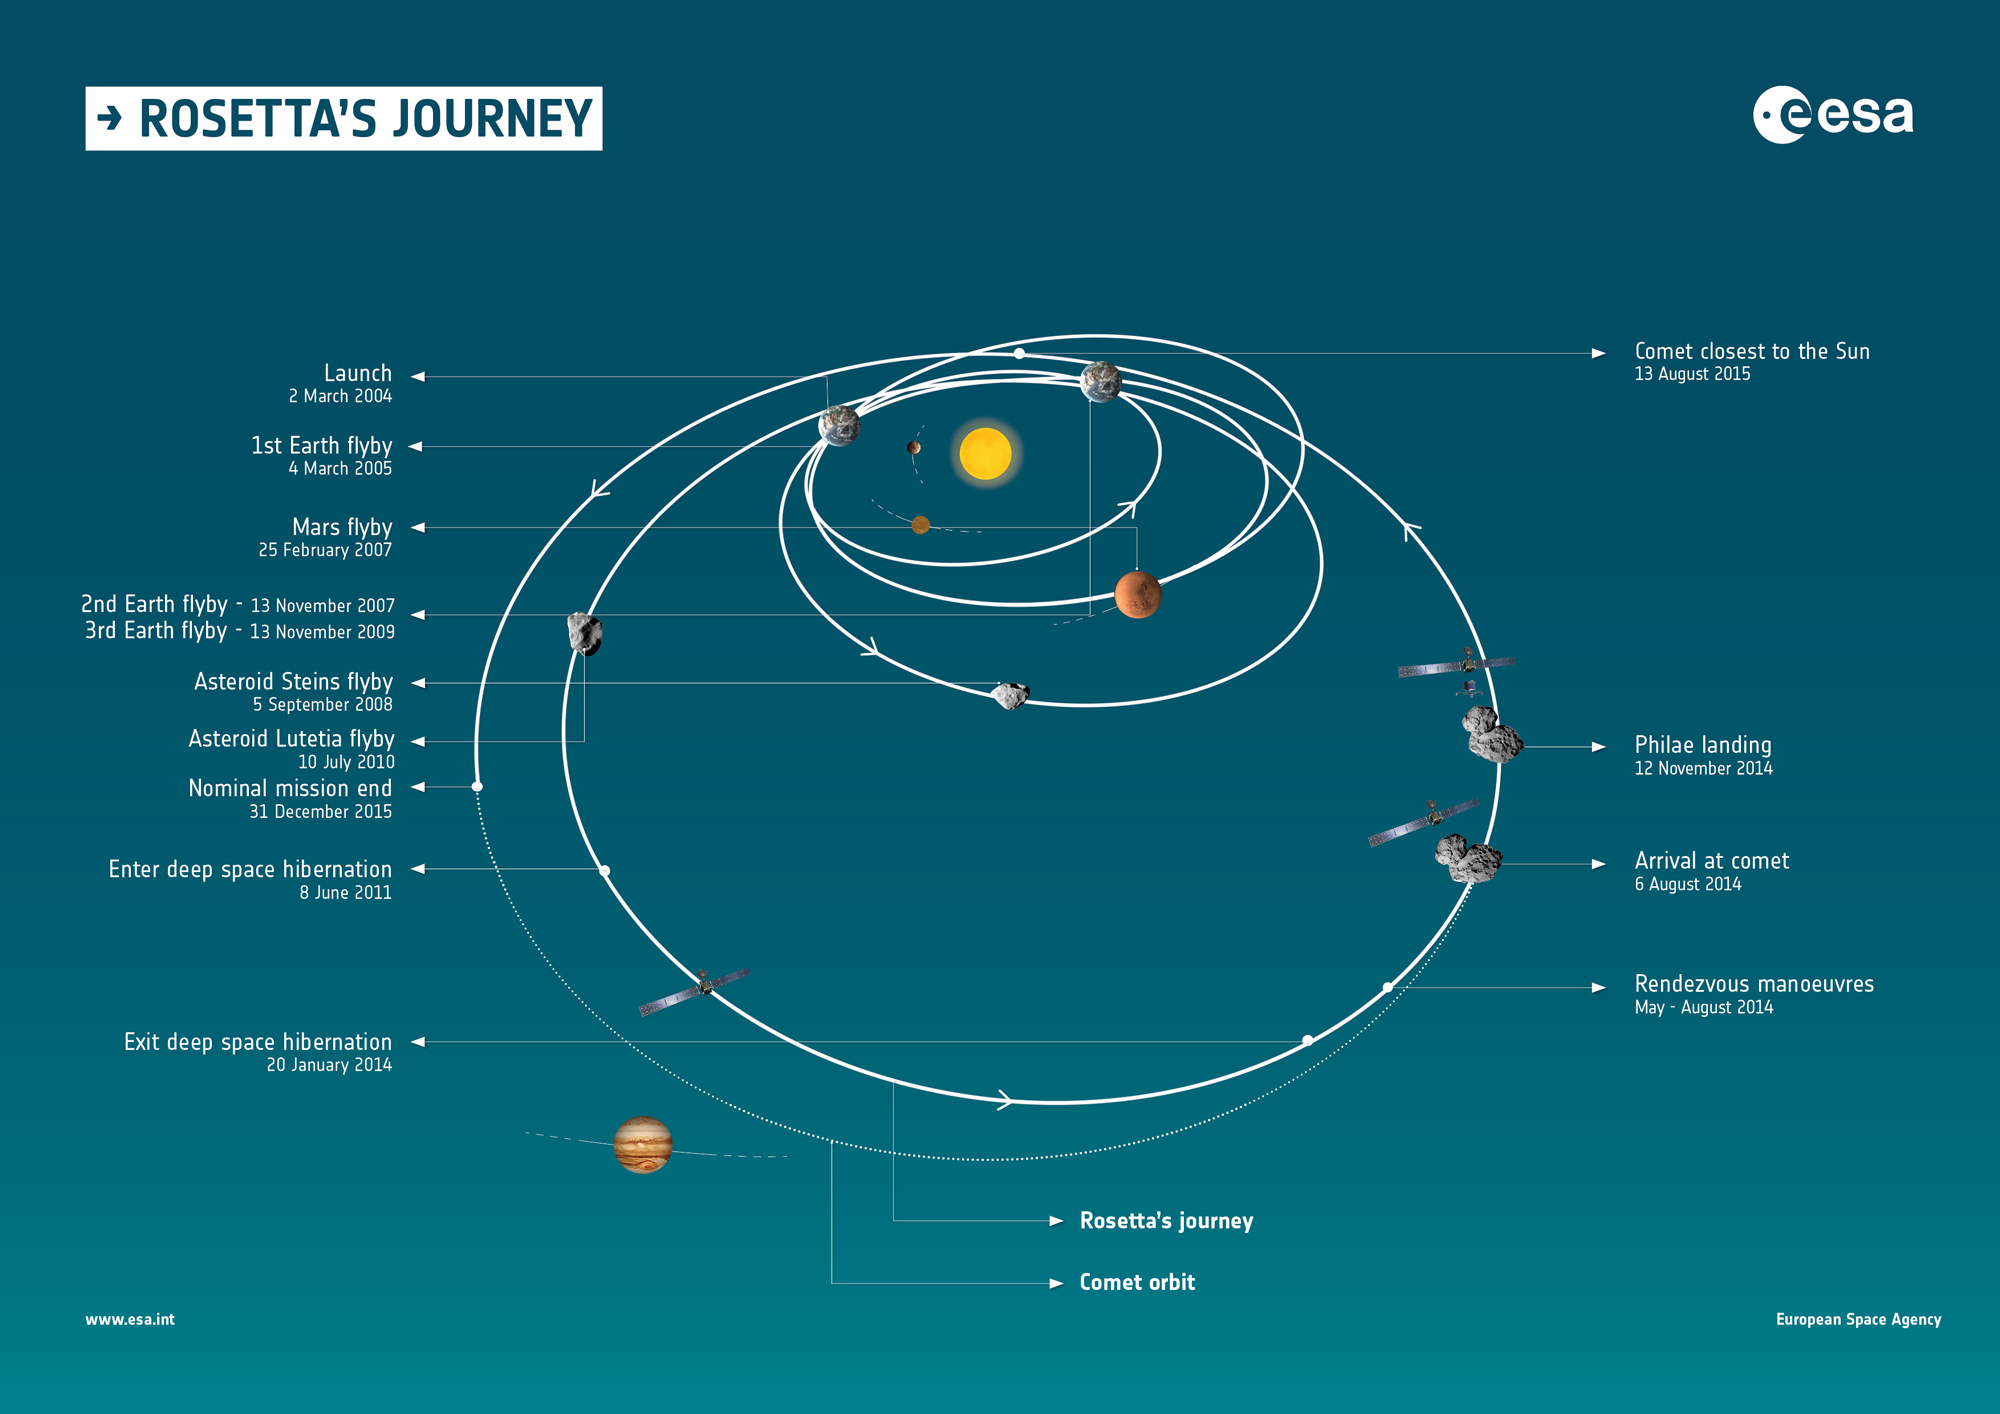 rosetta_journey